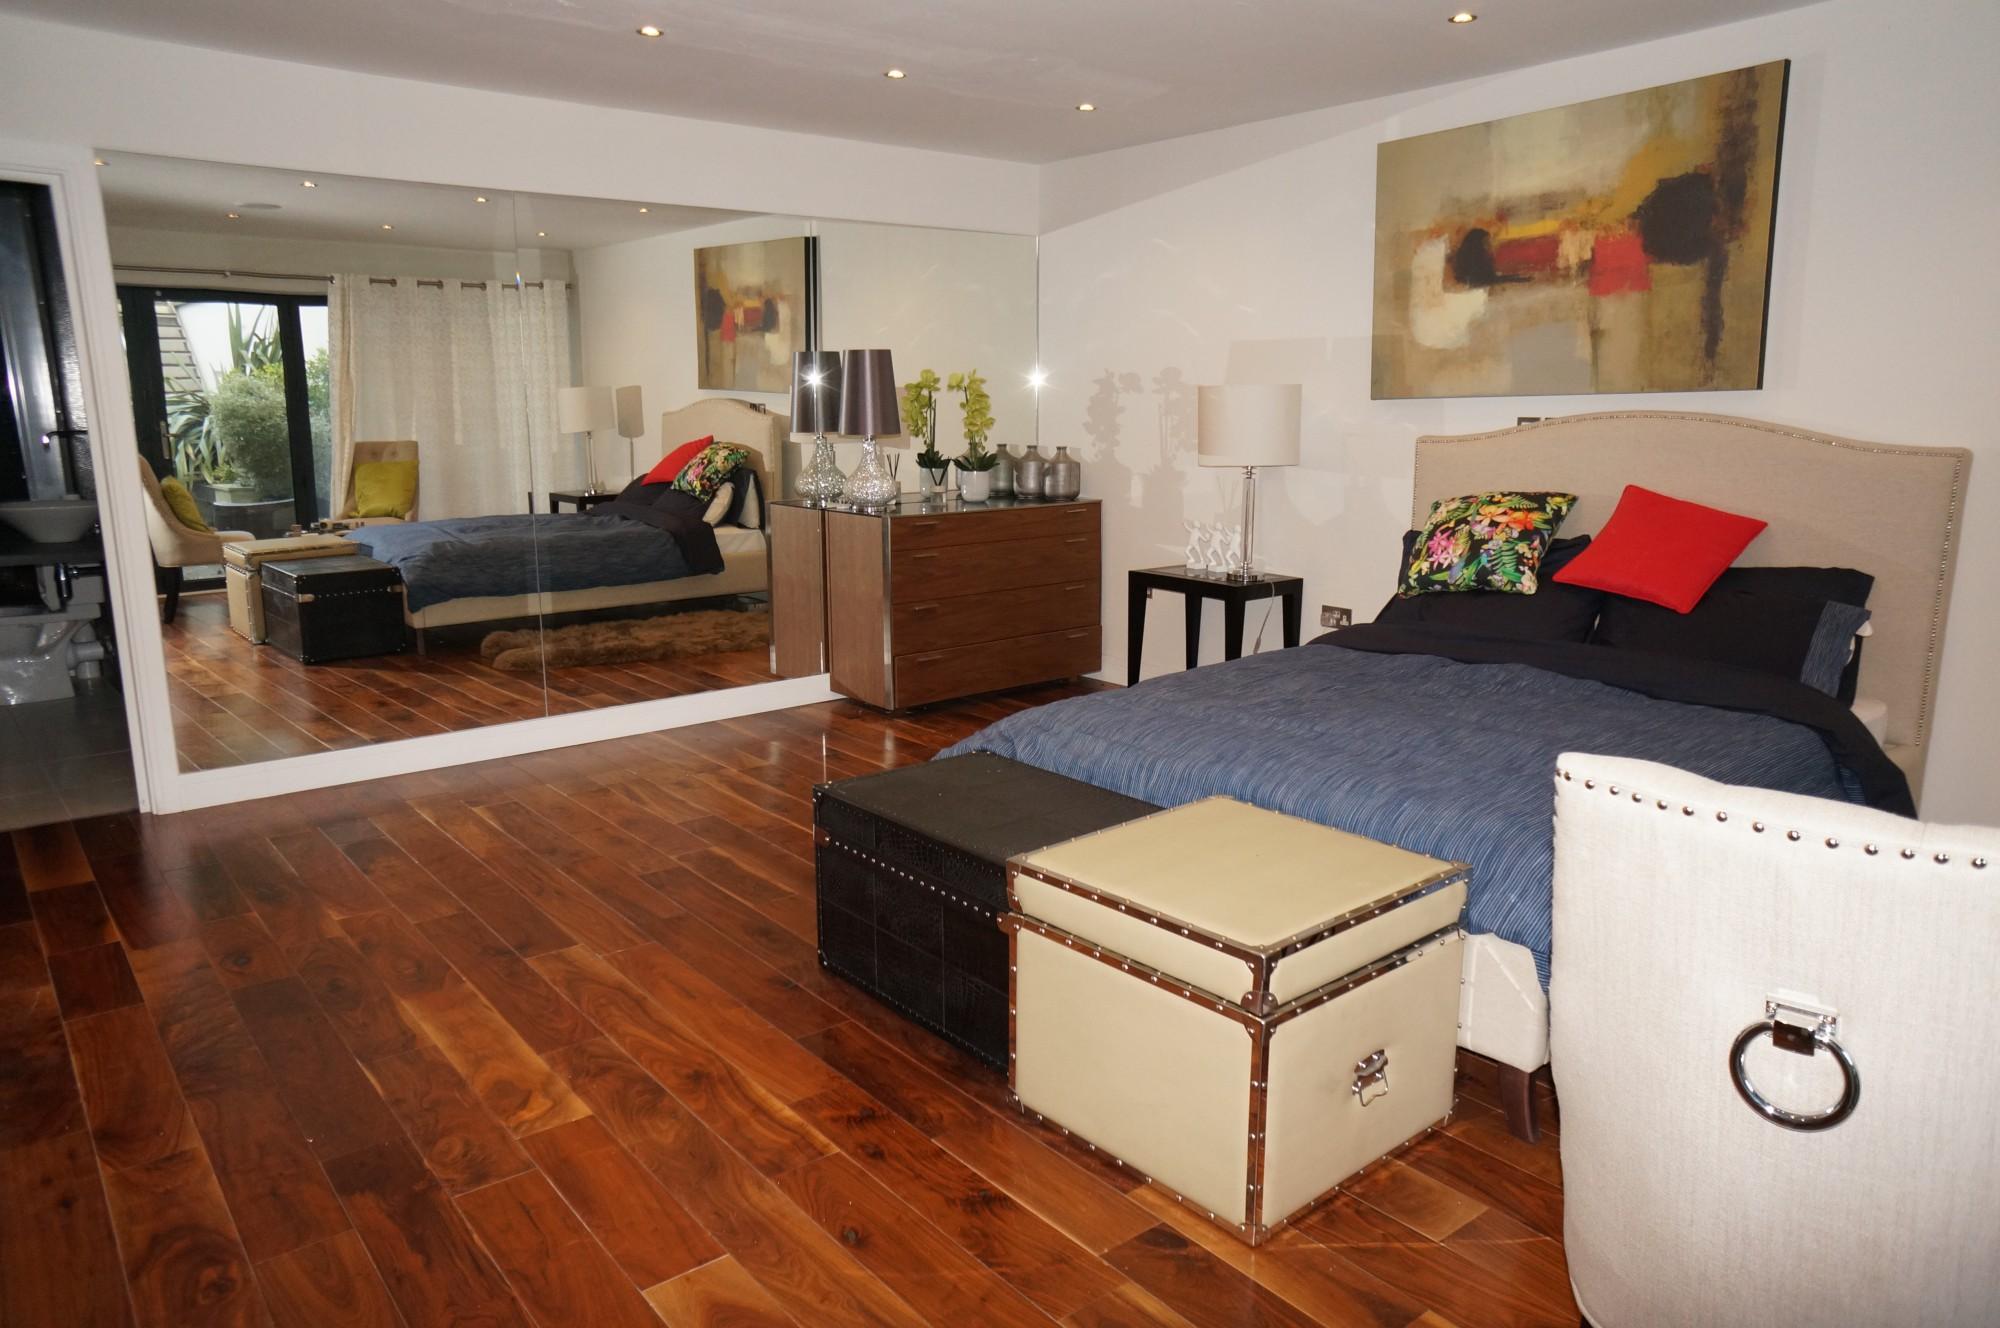 Amara Property,Master Bedroom